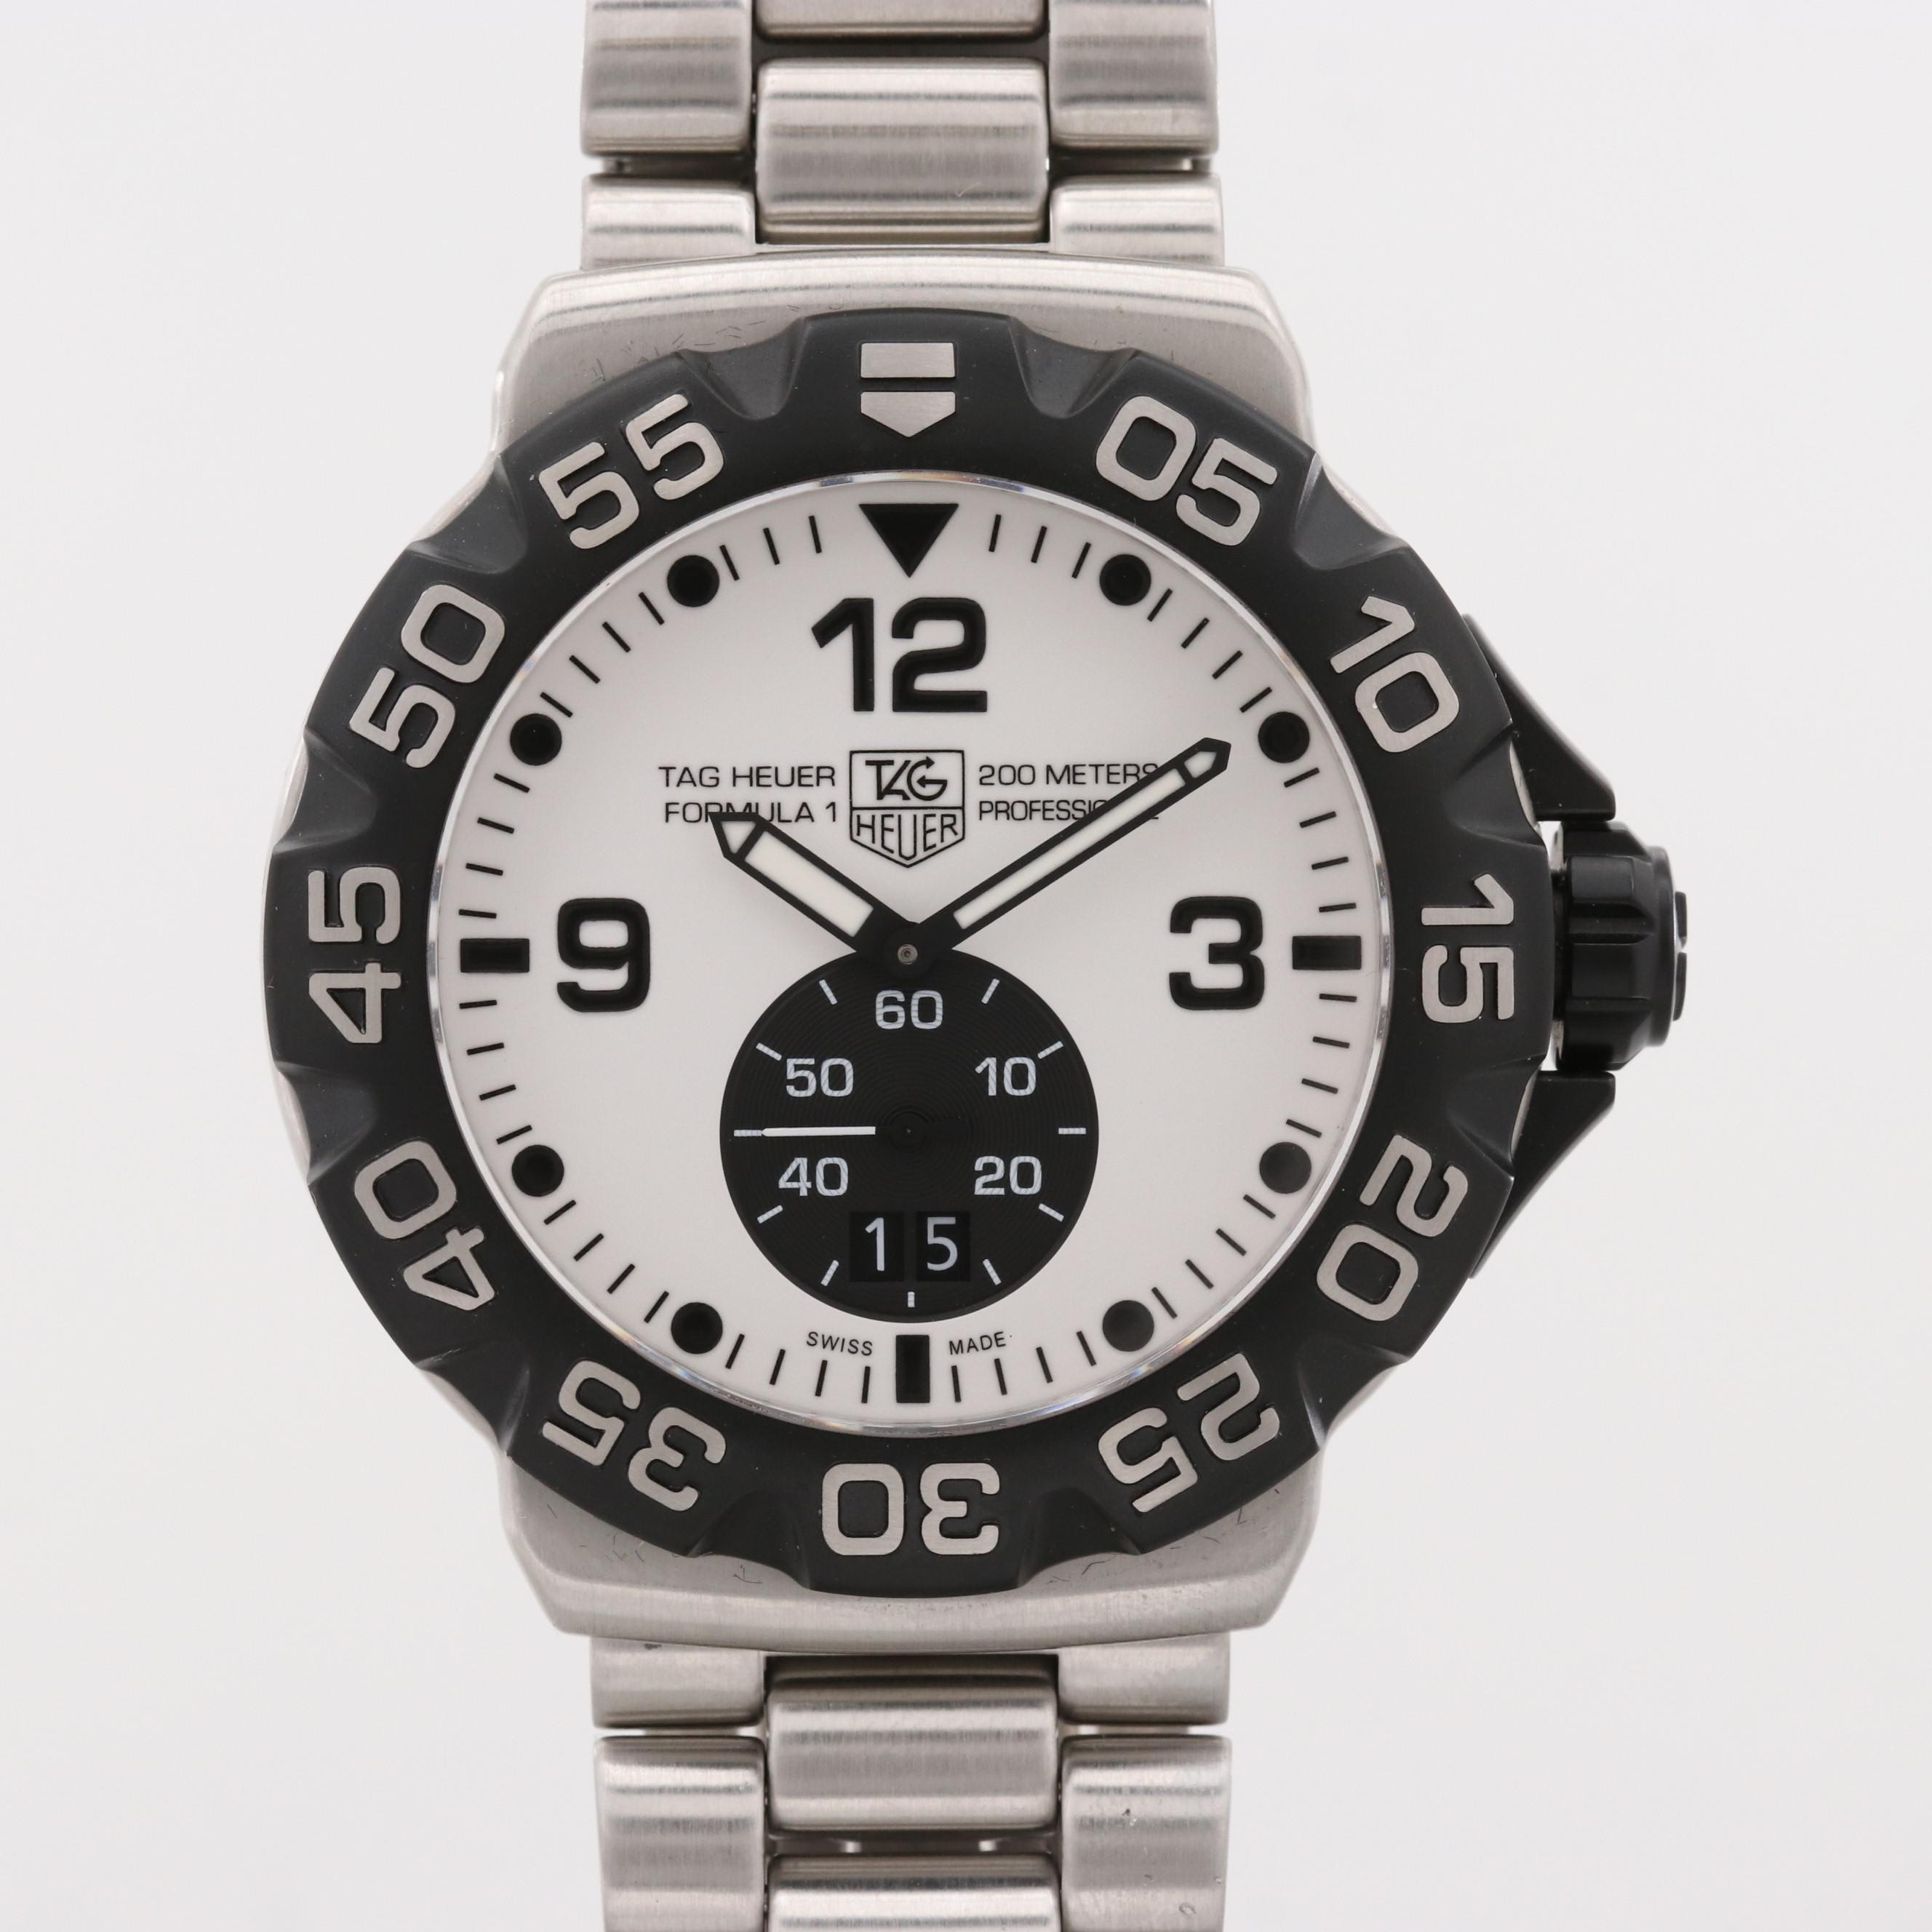 TAG Heur Formula 1 Stainless Steel Quartz Wristwatch